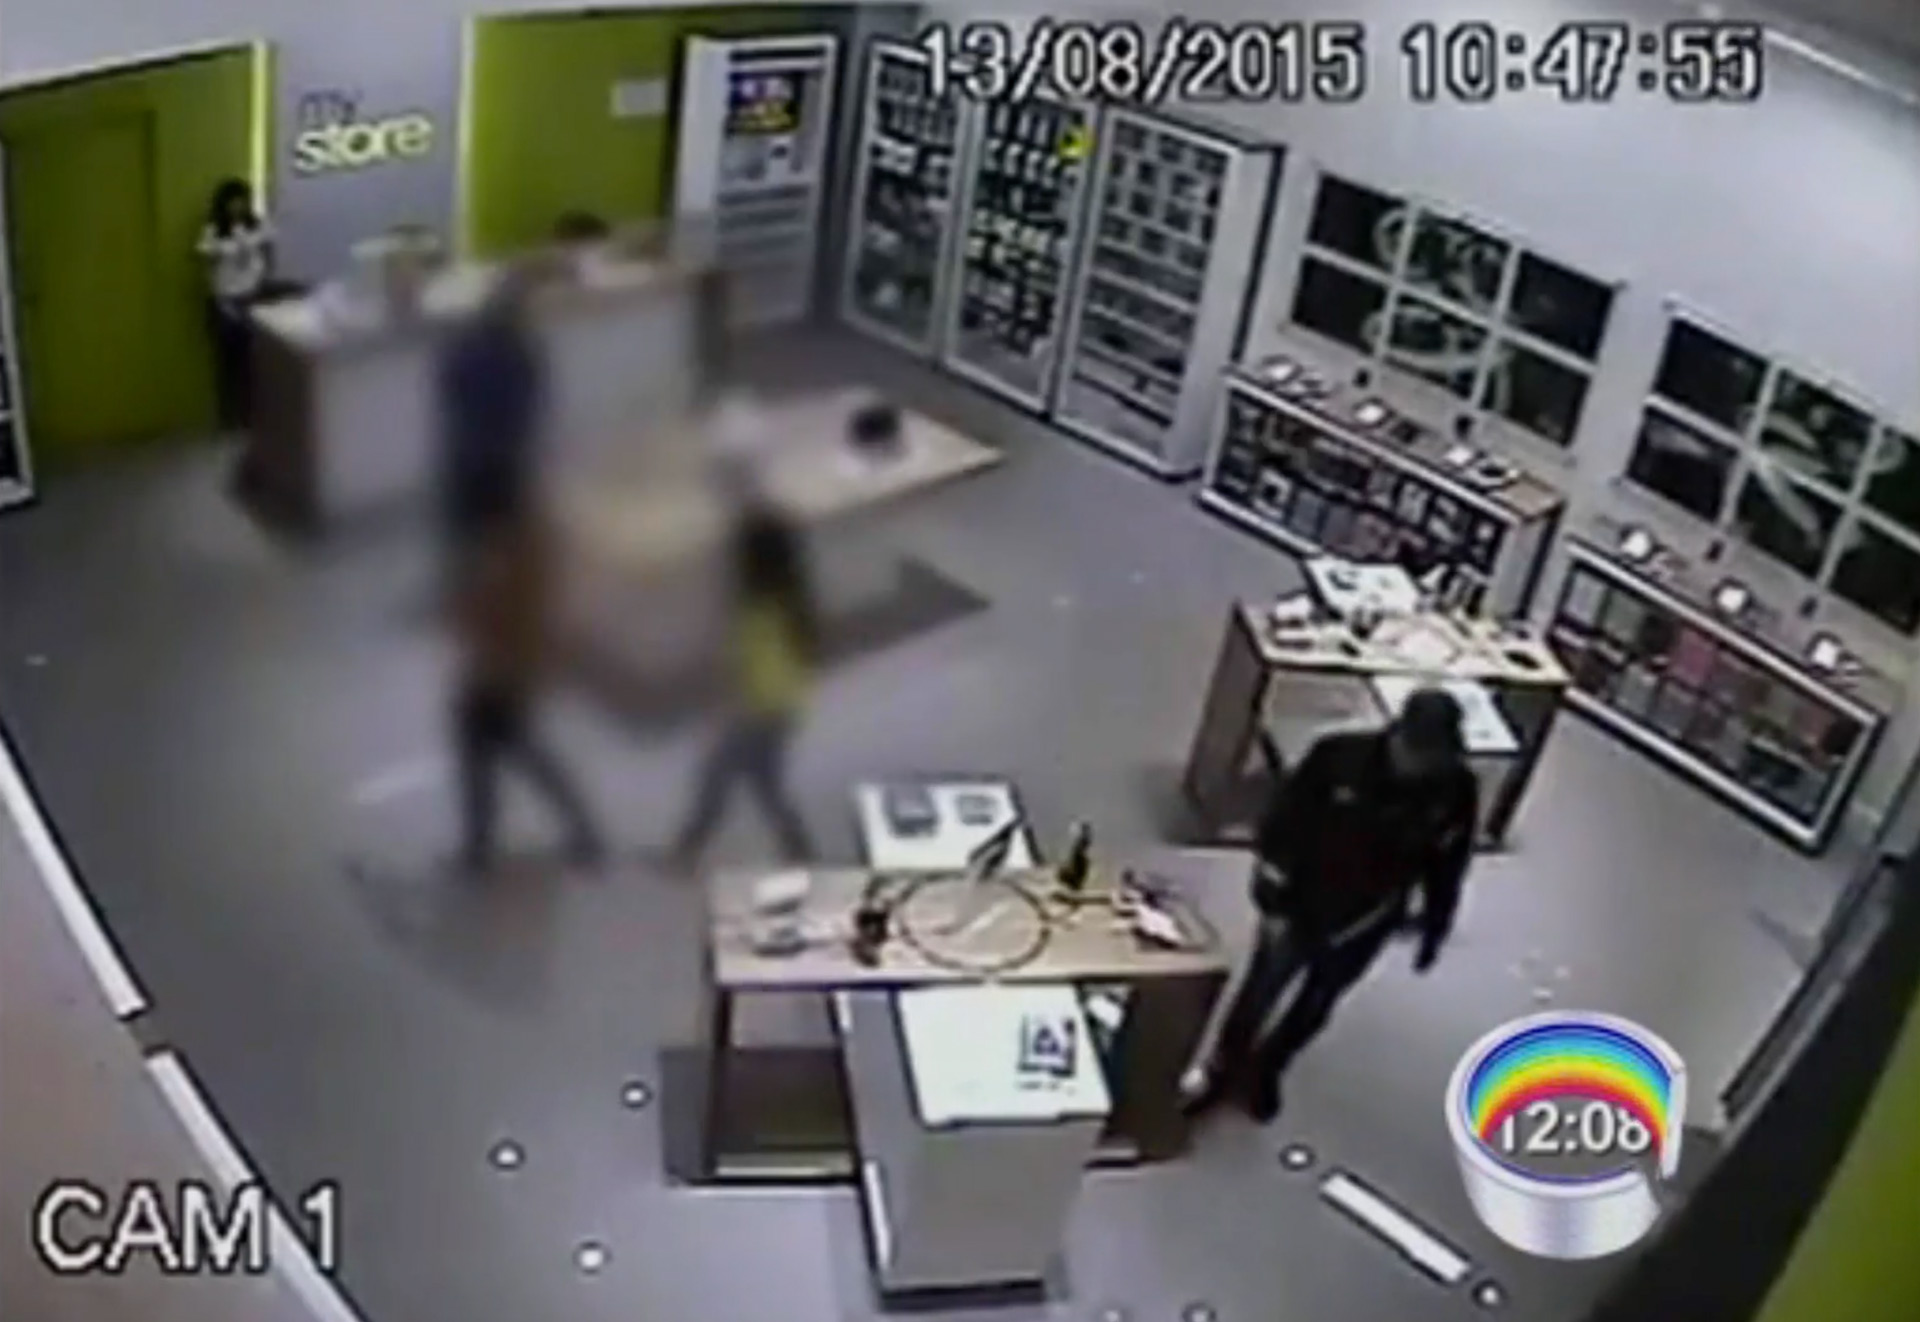 MyStore assaltada em Taubaté